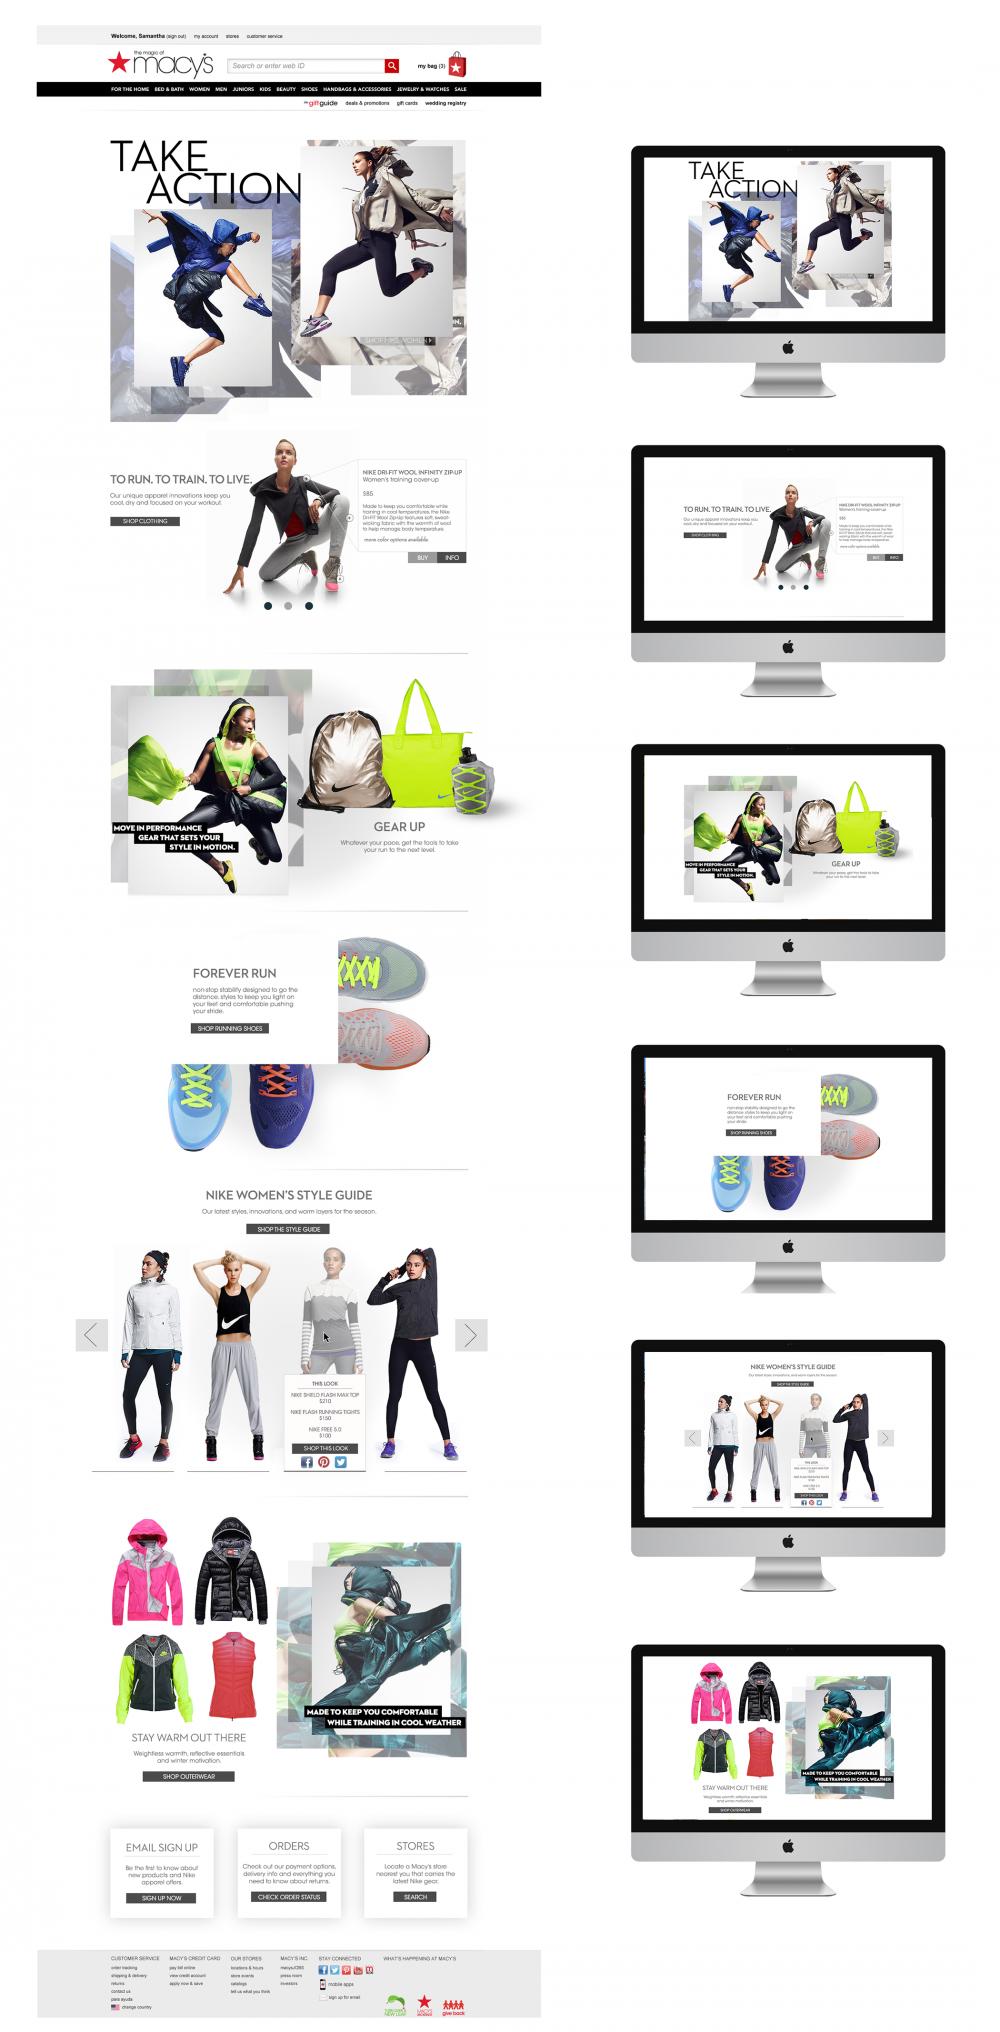 Nike_interative design_3